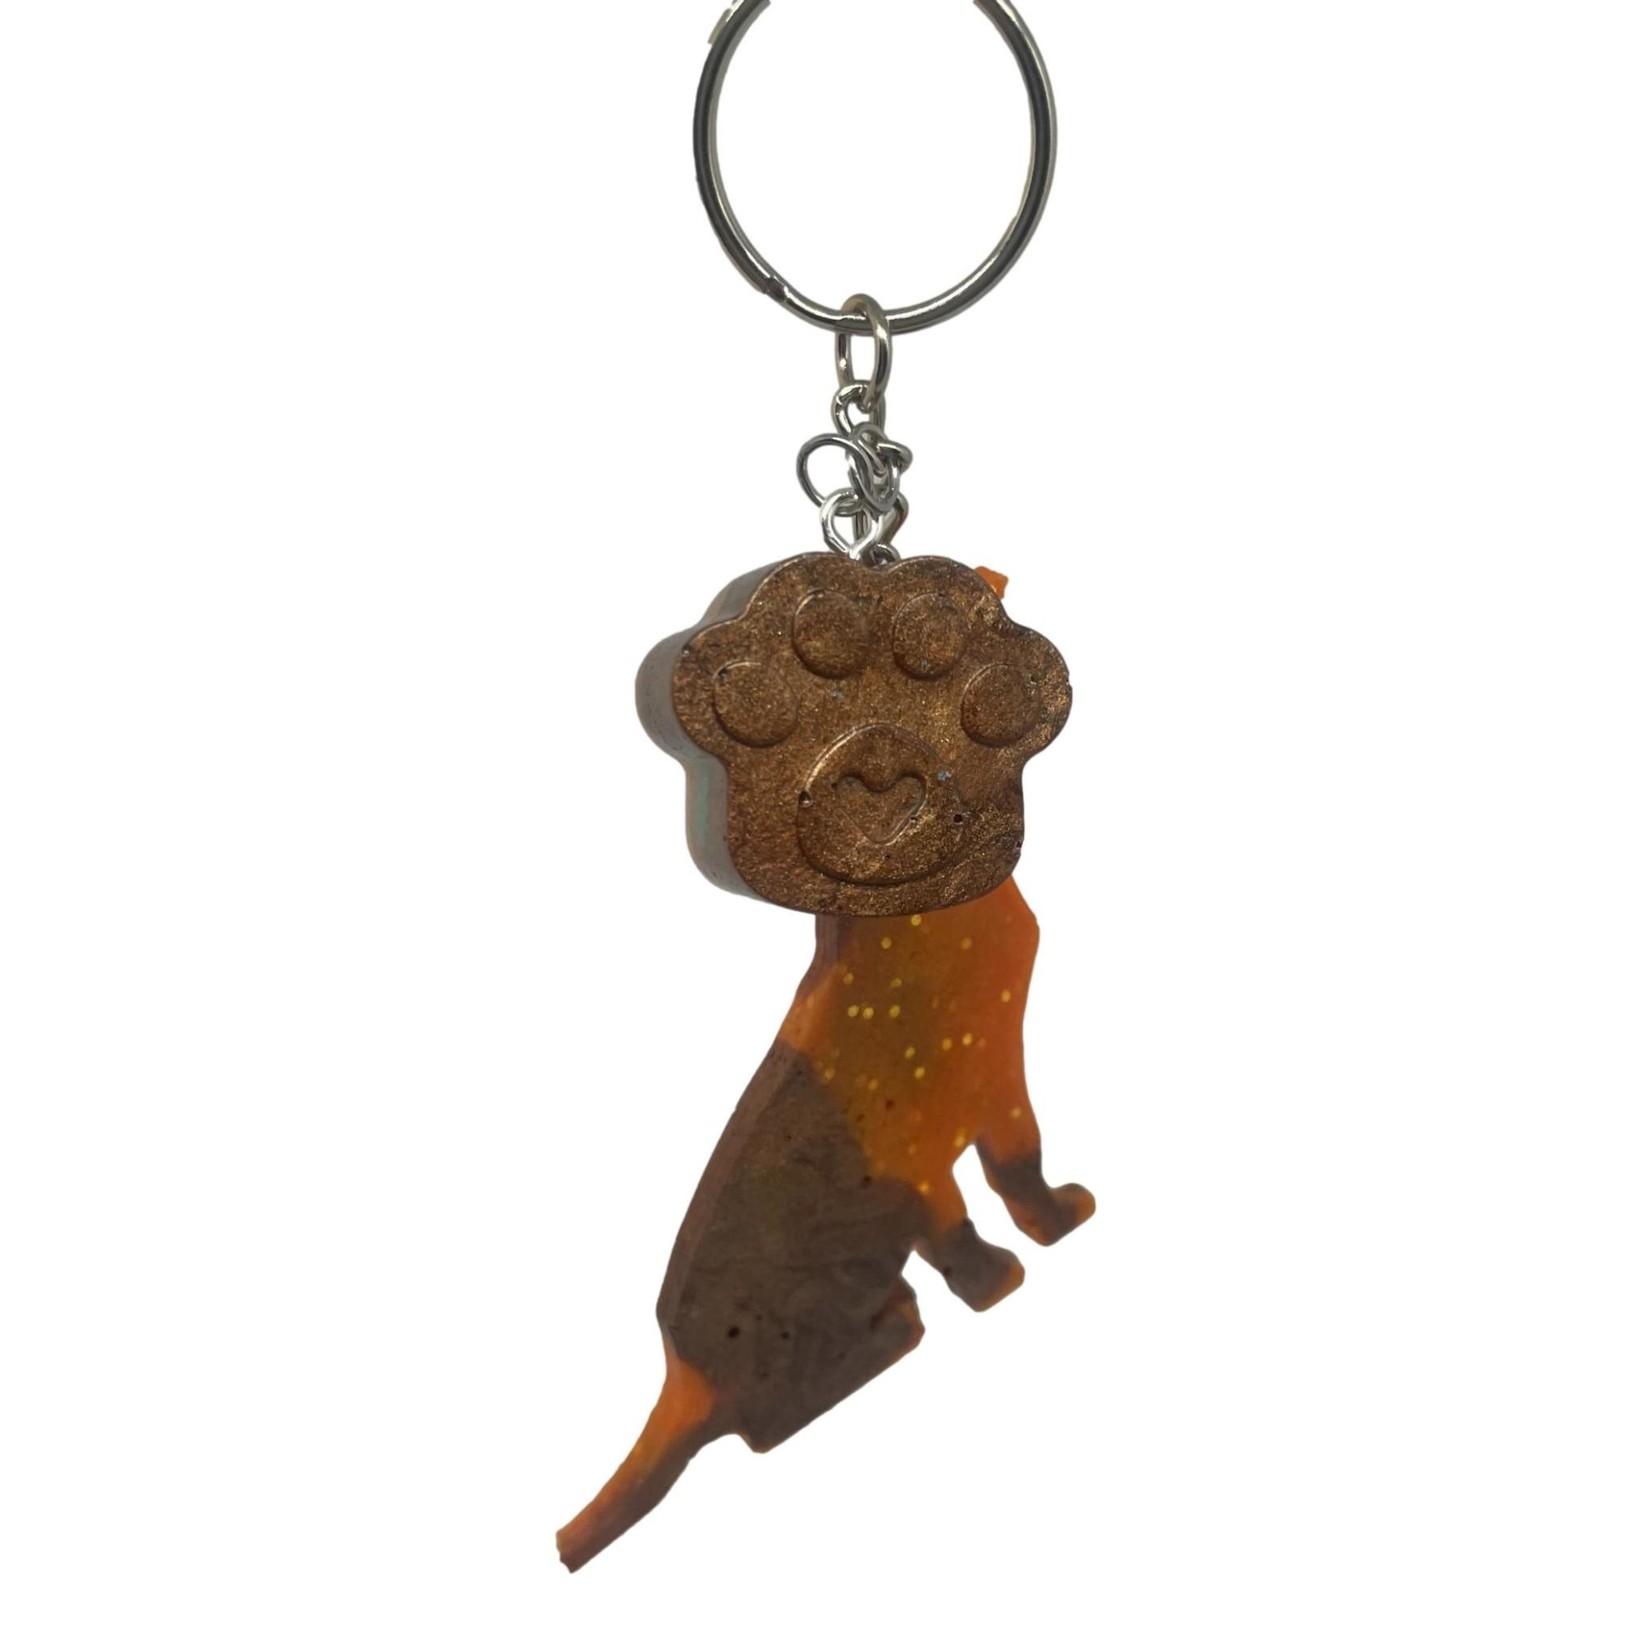 East Coast Sirens Orange & Brown Dog Keychain